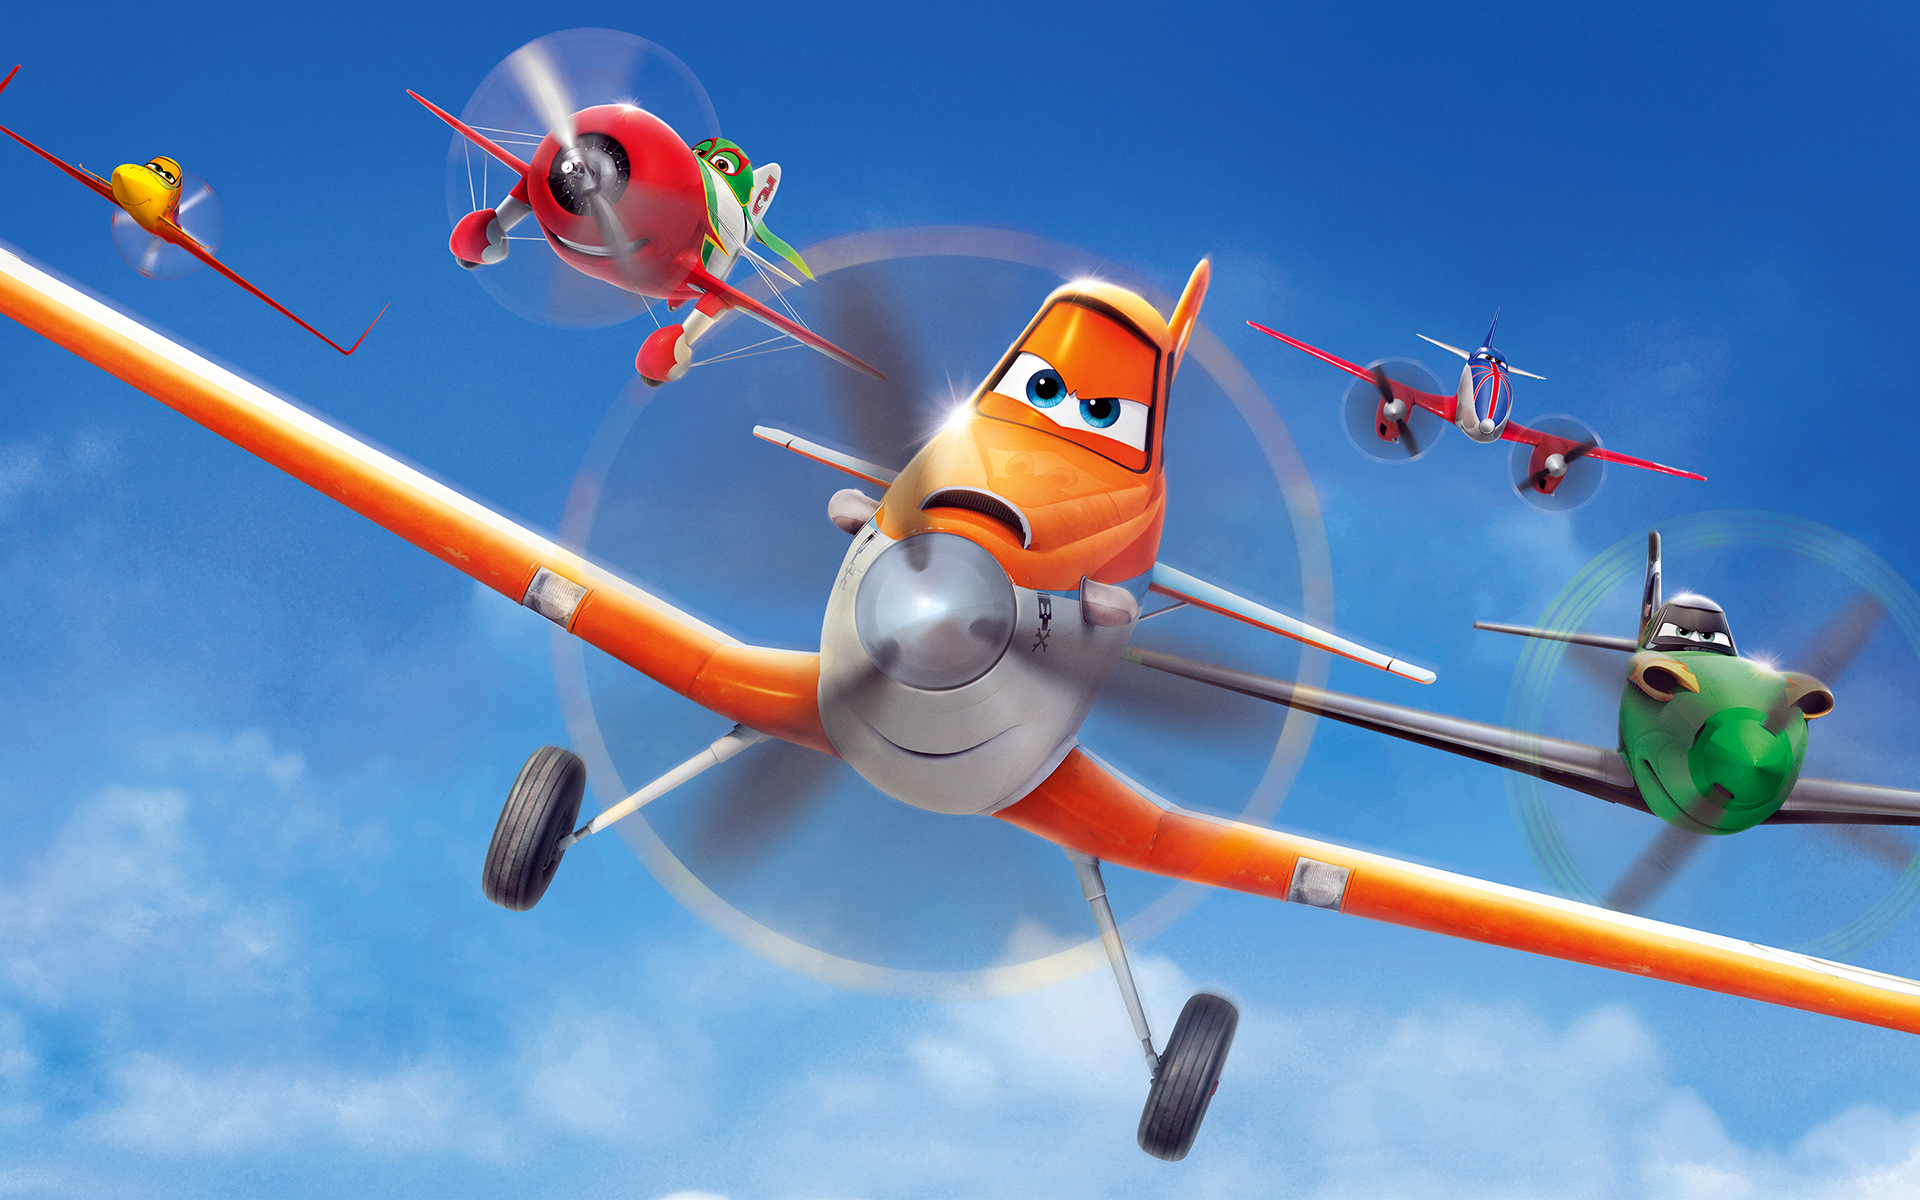 Cool Planes Movie Wallpaper